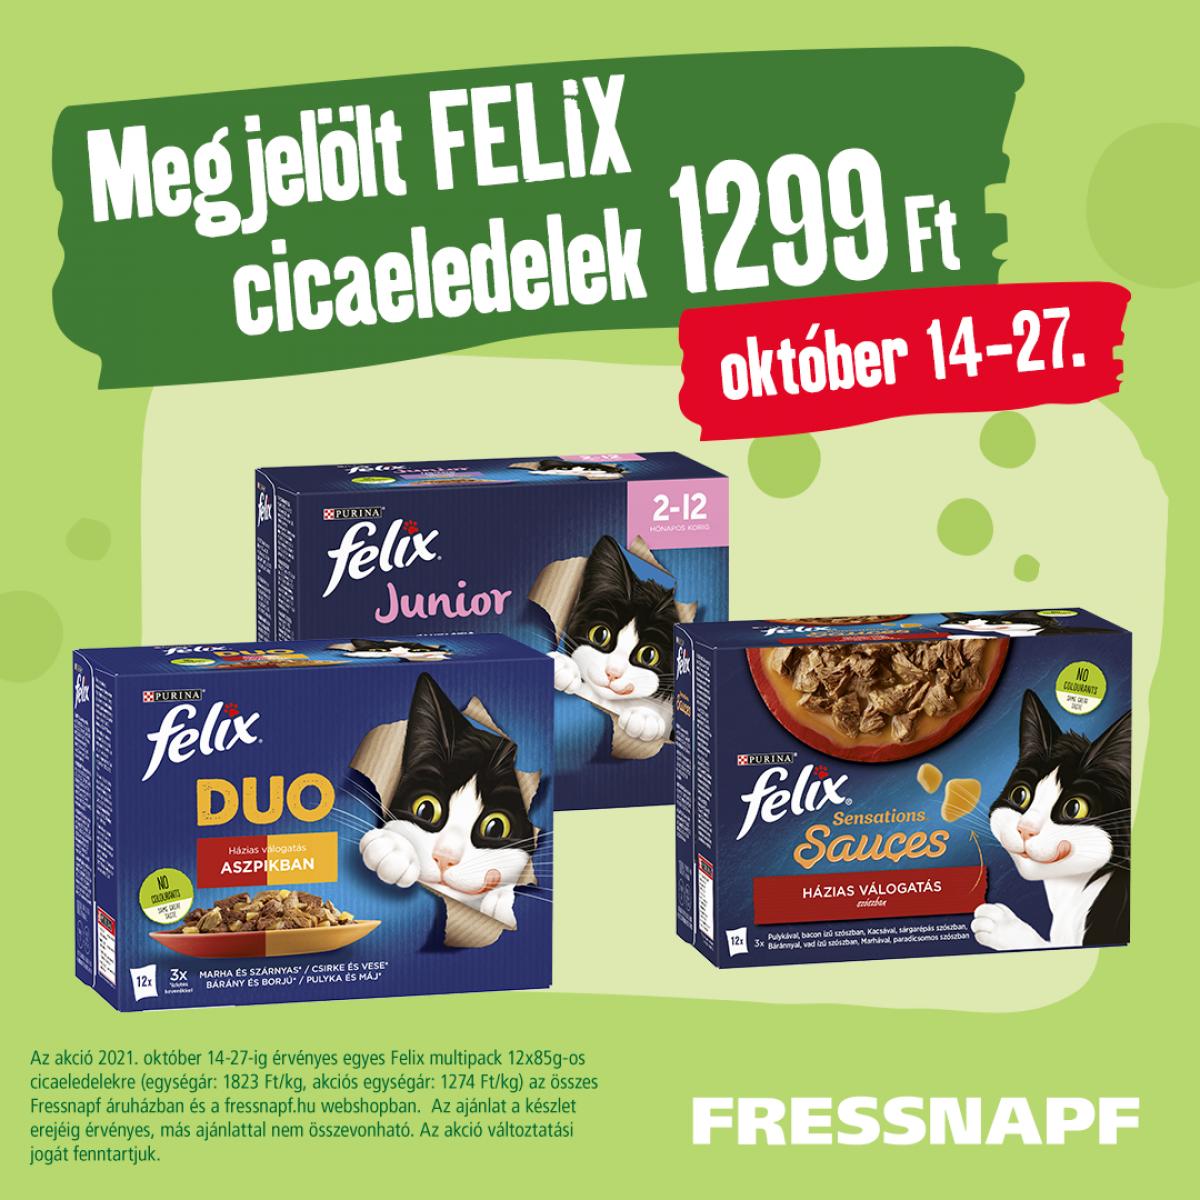 FN_Felix_1080x1080 (1)